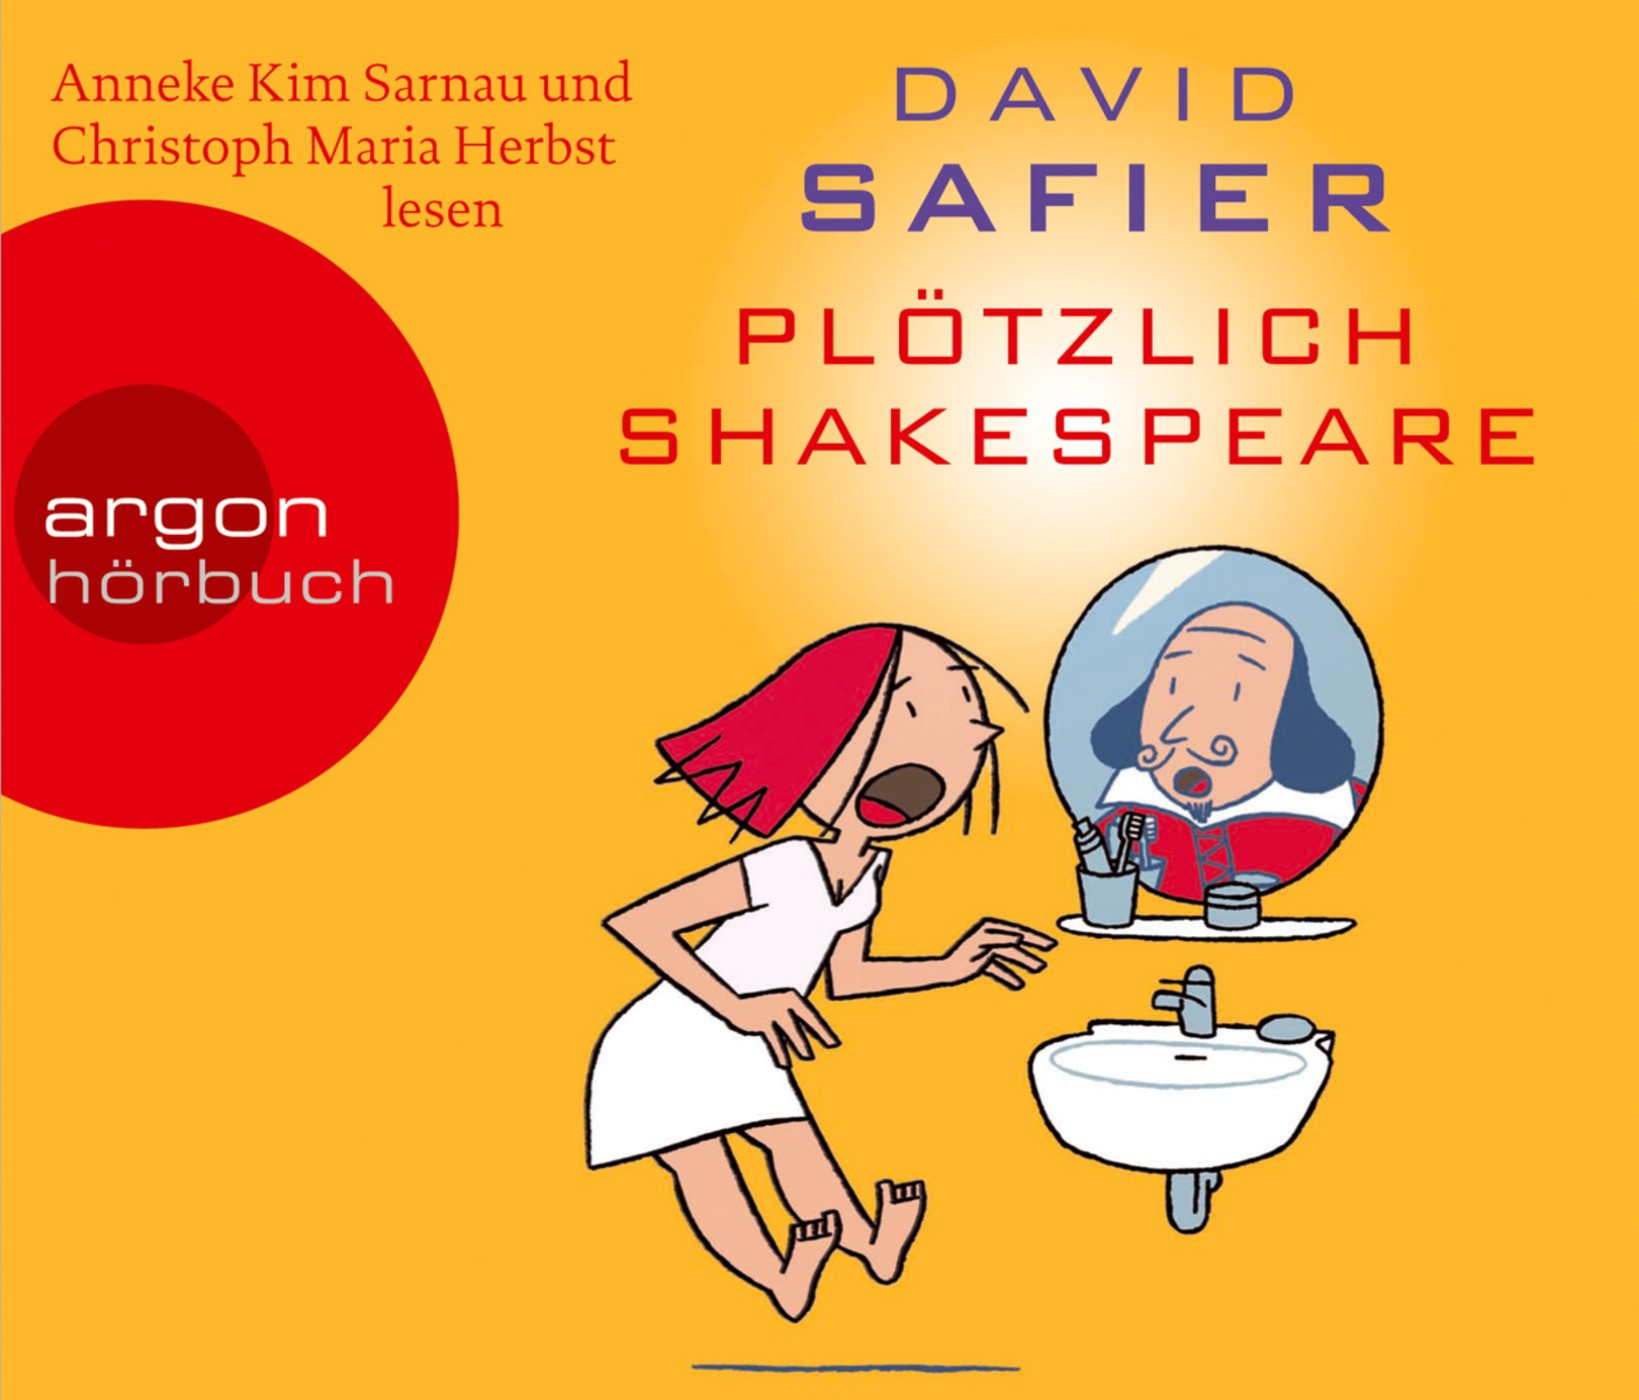 David Safier - Plötzlich Shakespeare